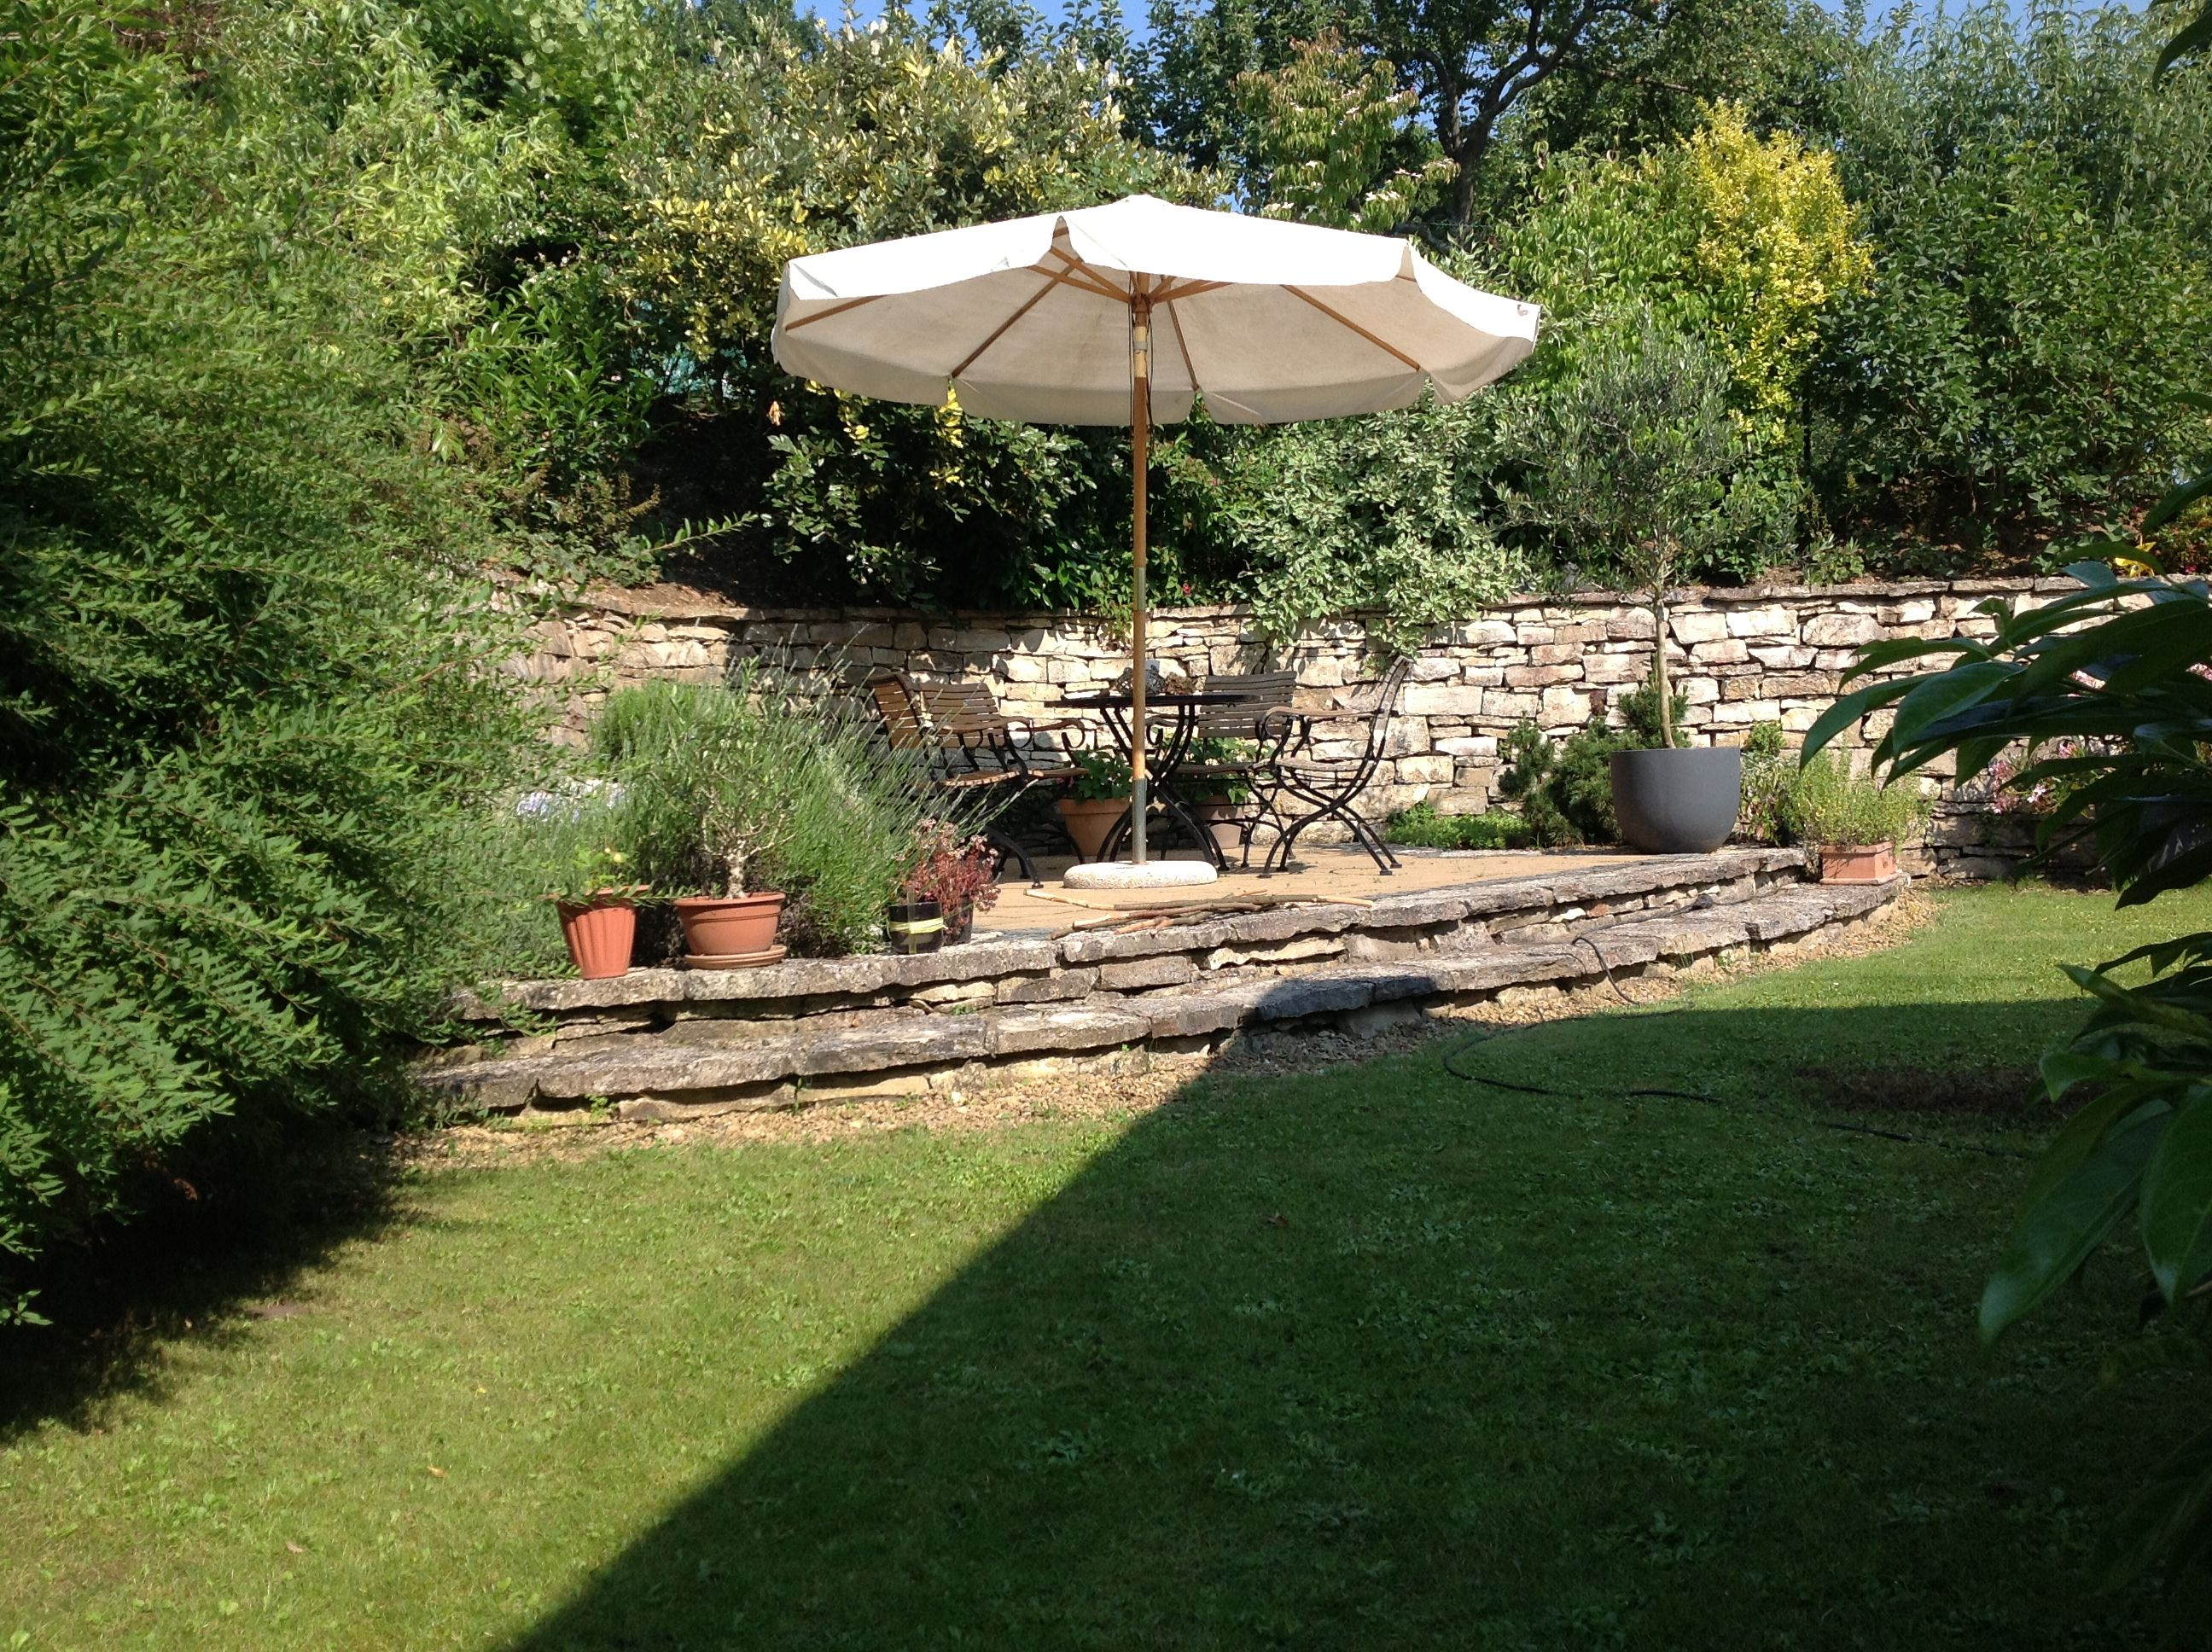 Gartenmöbel Mediterran our mediterran garden stylecheck gartenmöbel mediterran